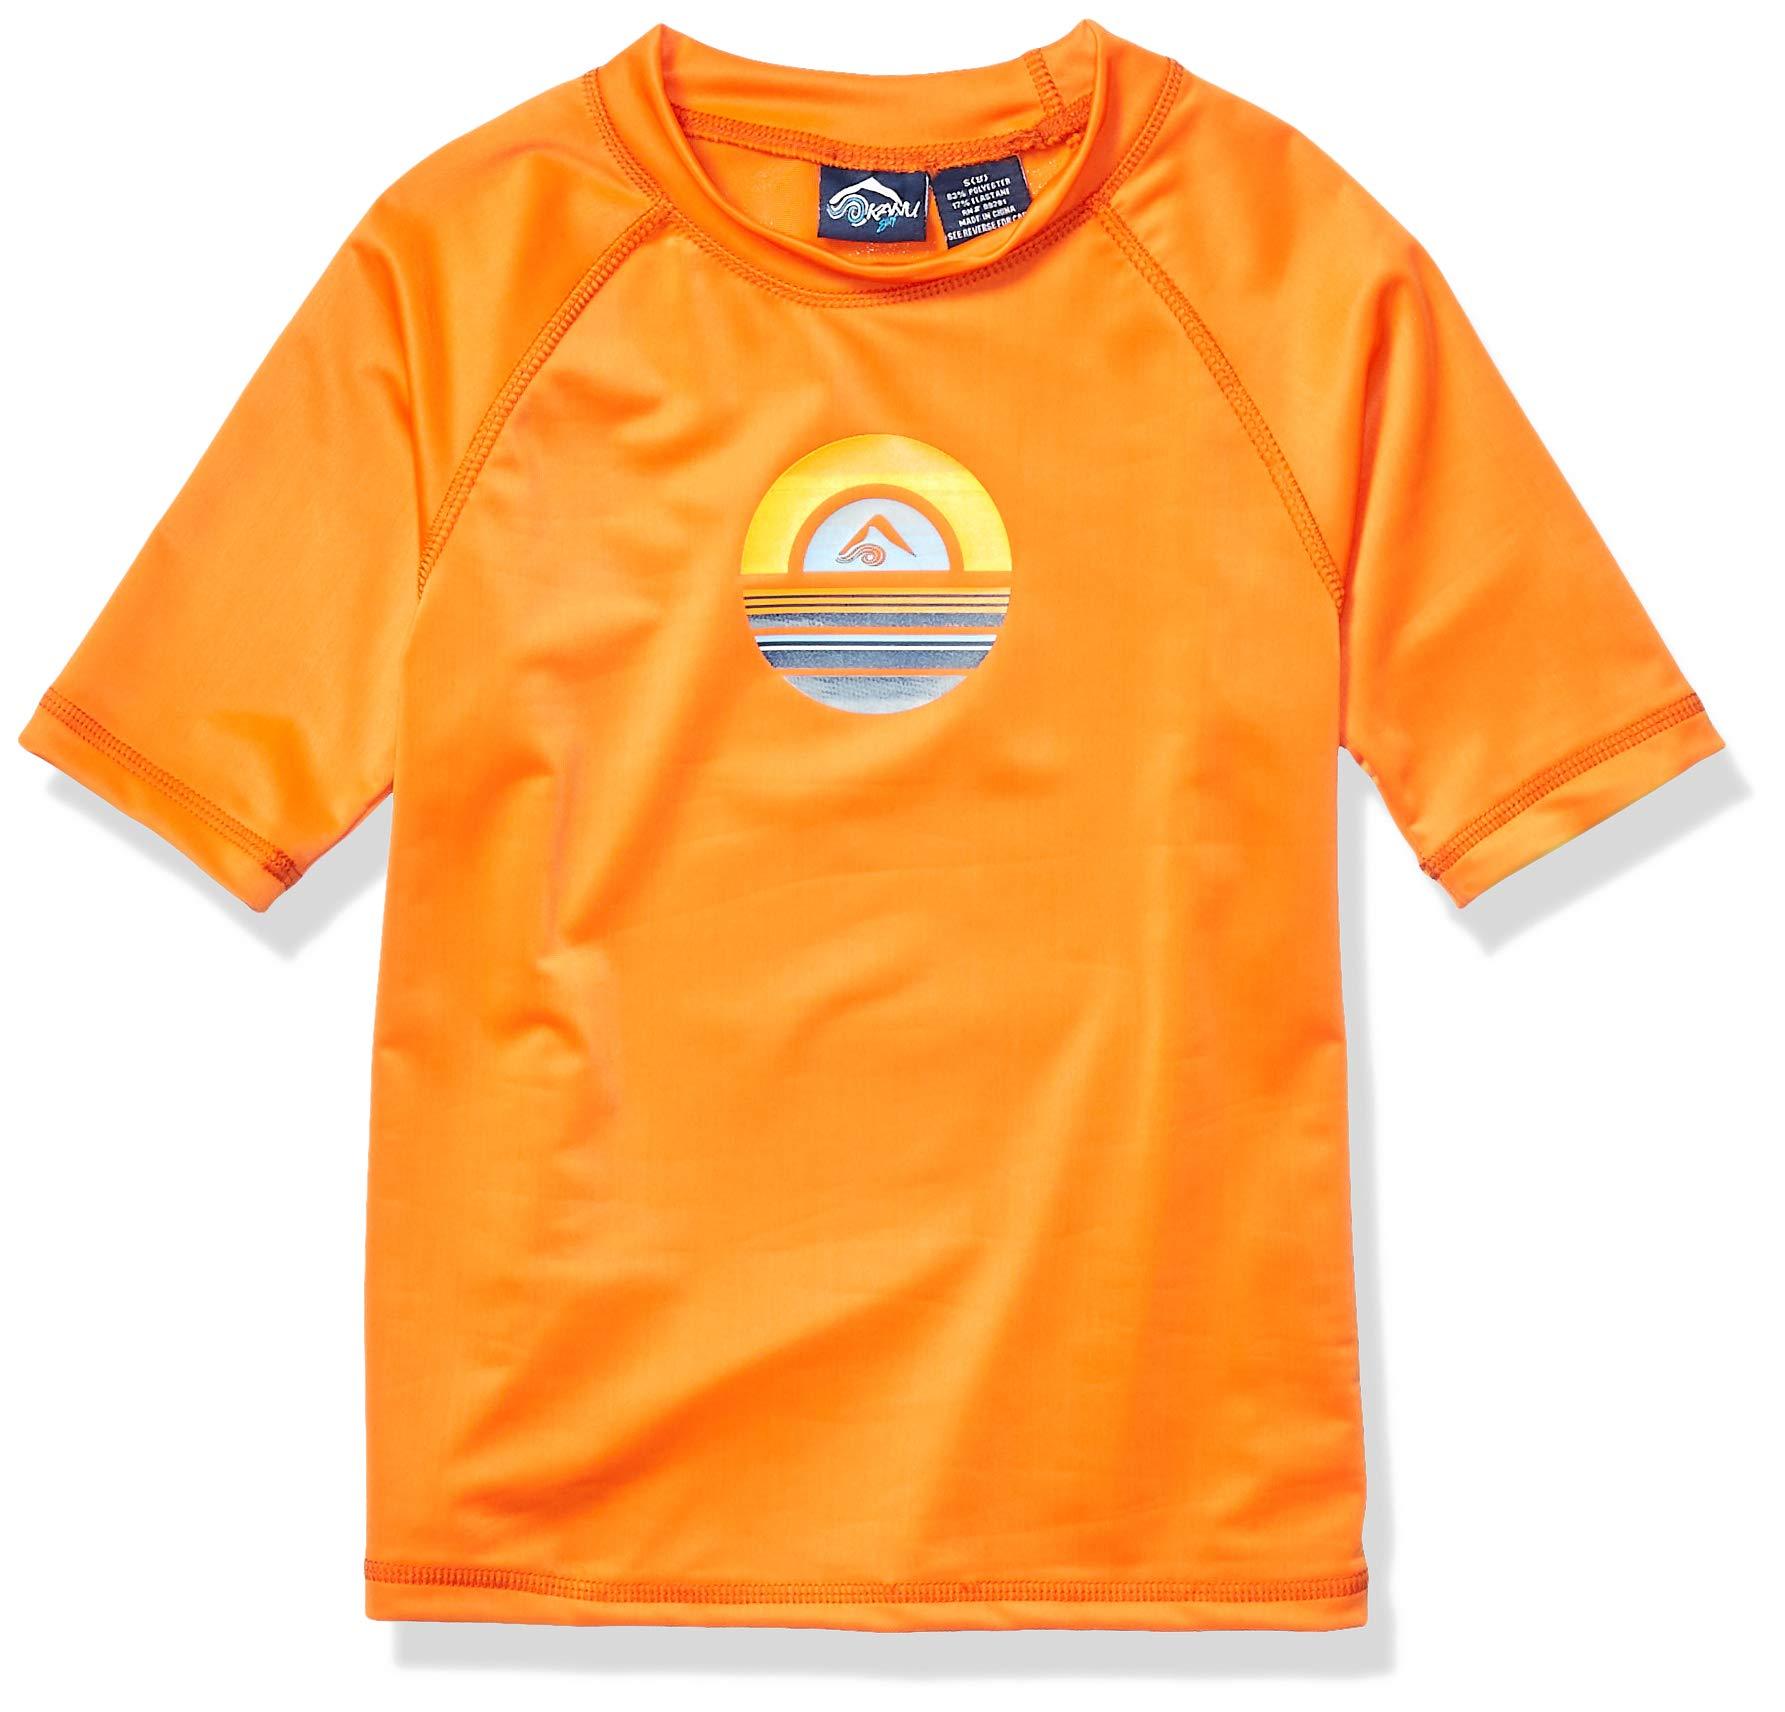 Kanu Surf Boys' Haywire UPF 50+ Sun Protective Rashguard Swim Shirt